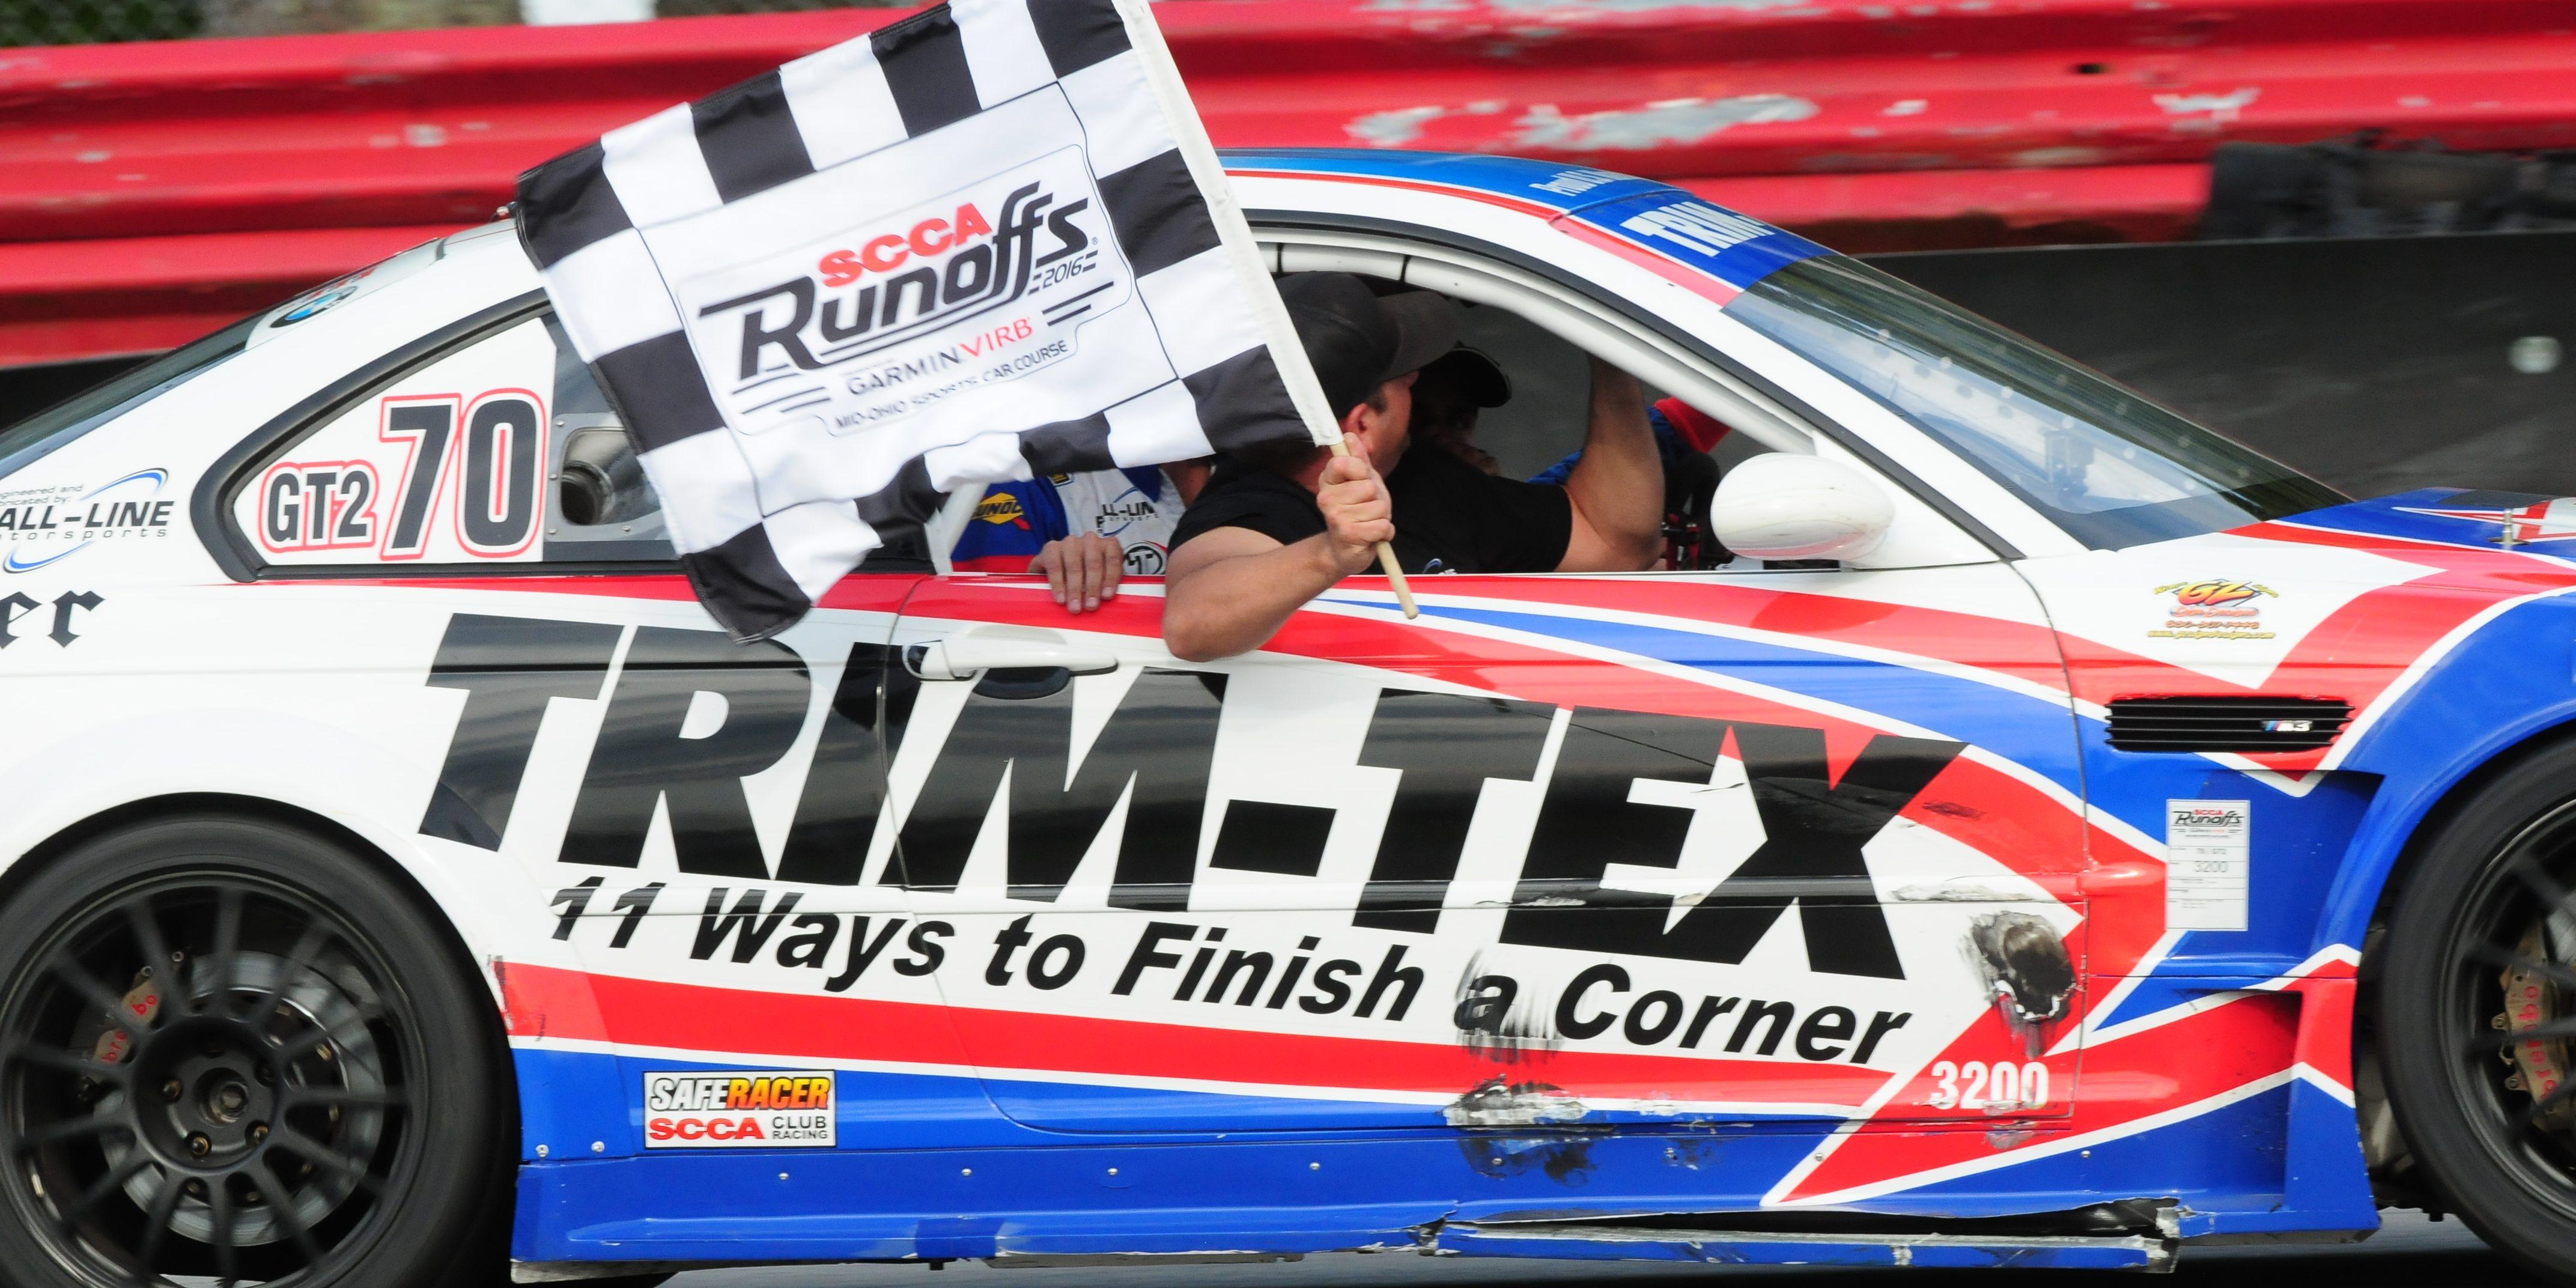 Trent Hindman, Trim-Tex Motorsports